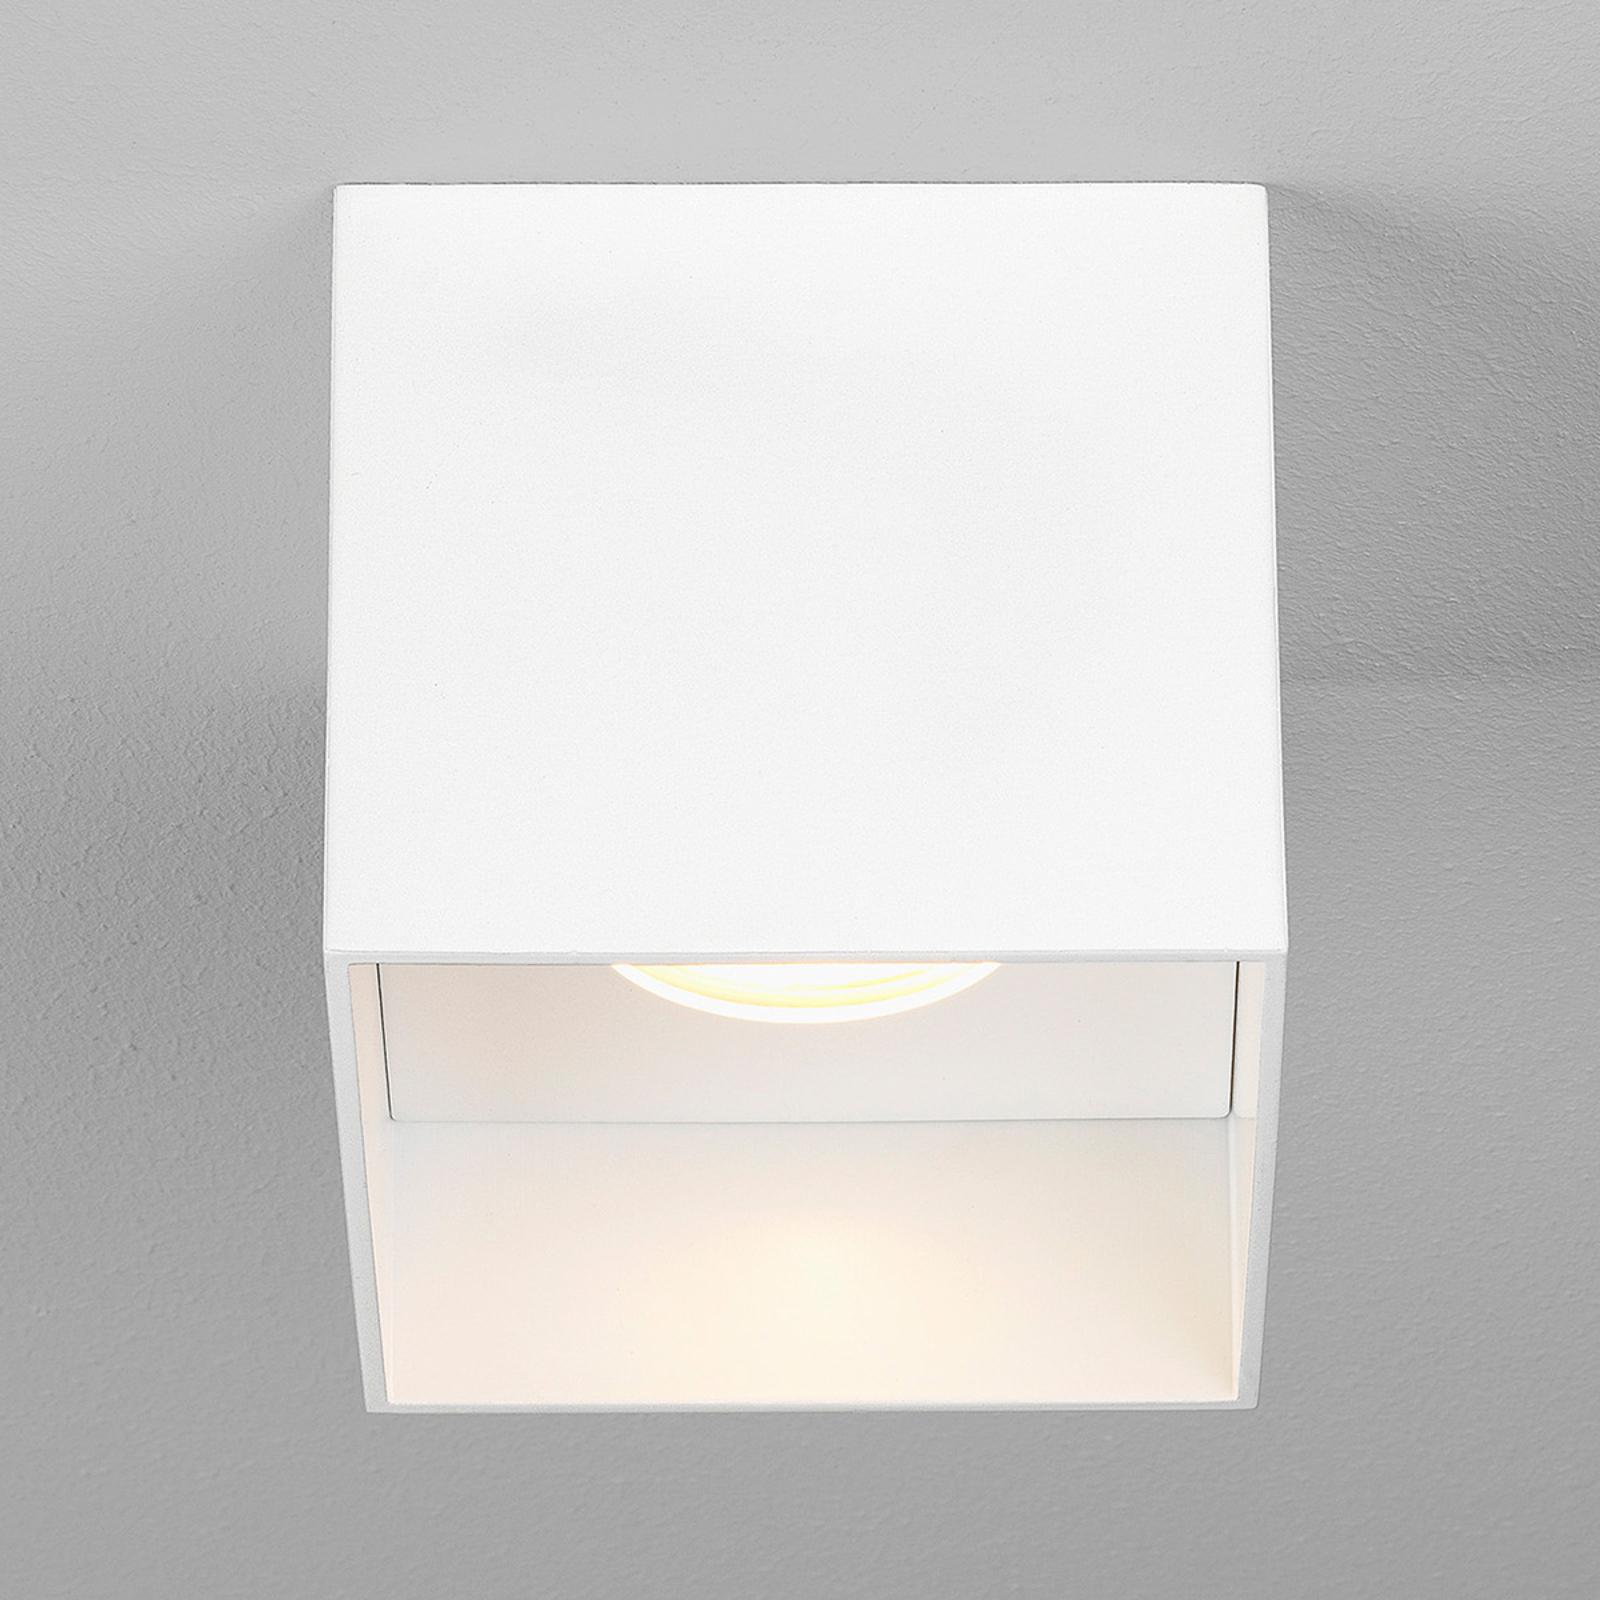 Astro Osca Square LED-taklampe, hvit